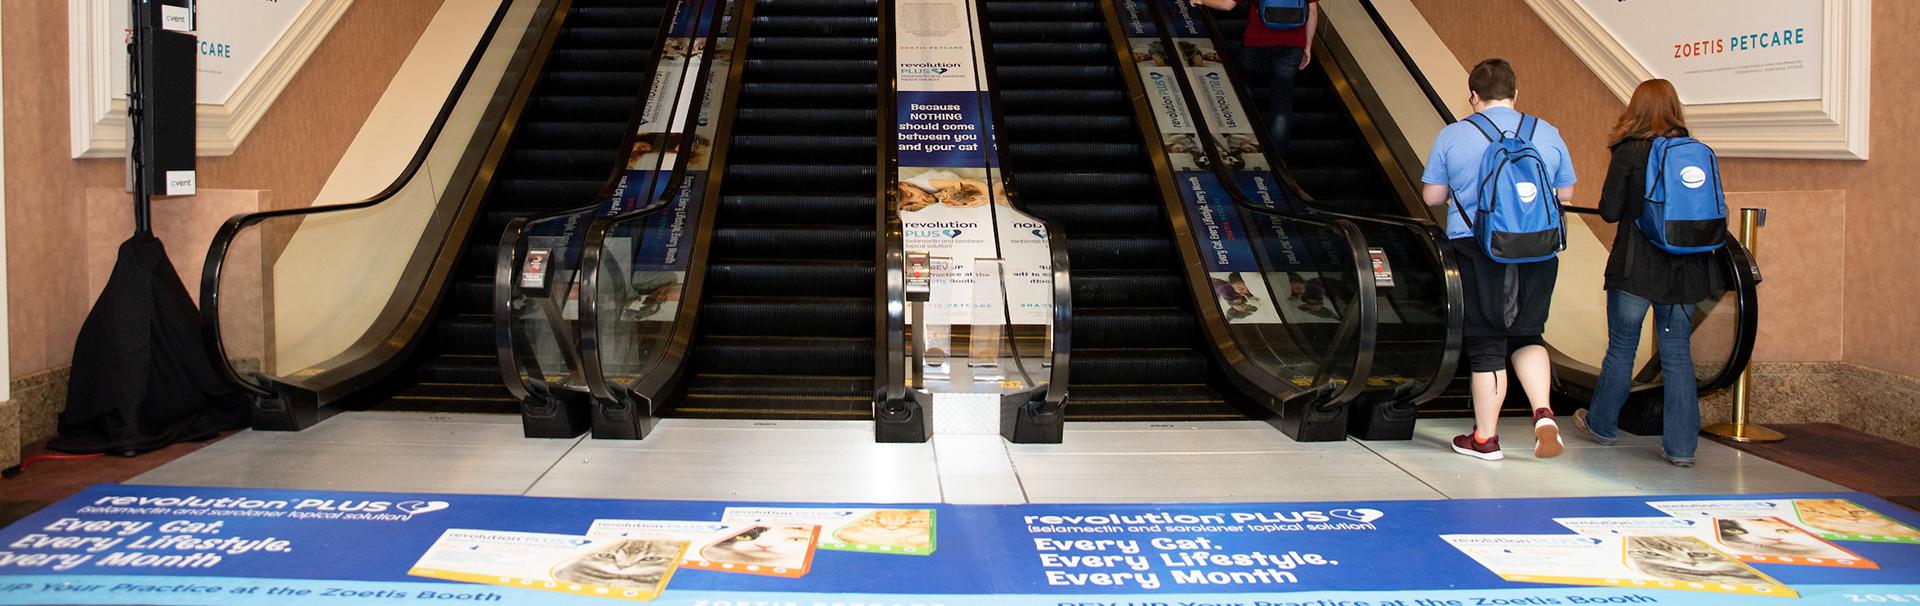 1920x606_Advertising_Escalators